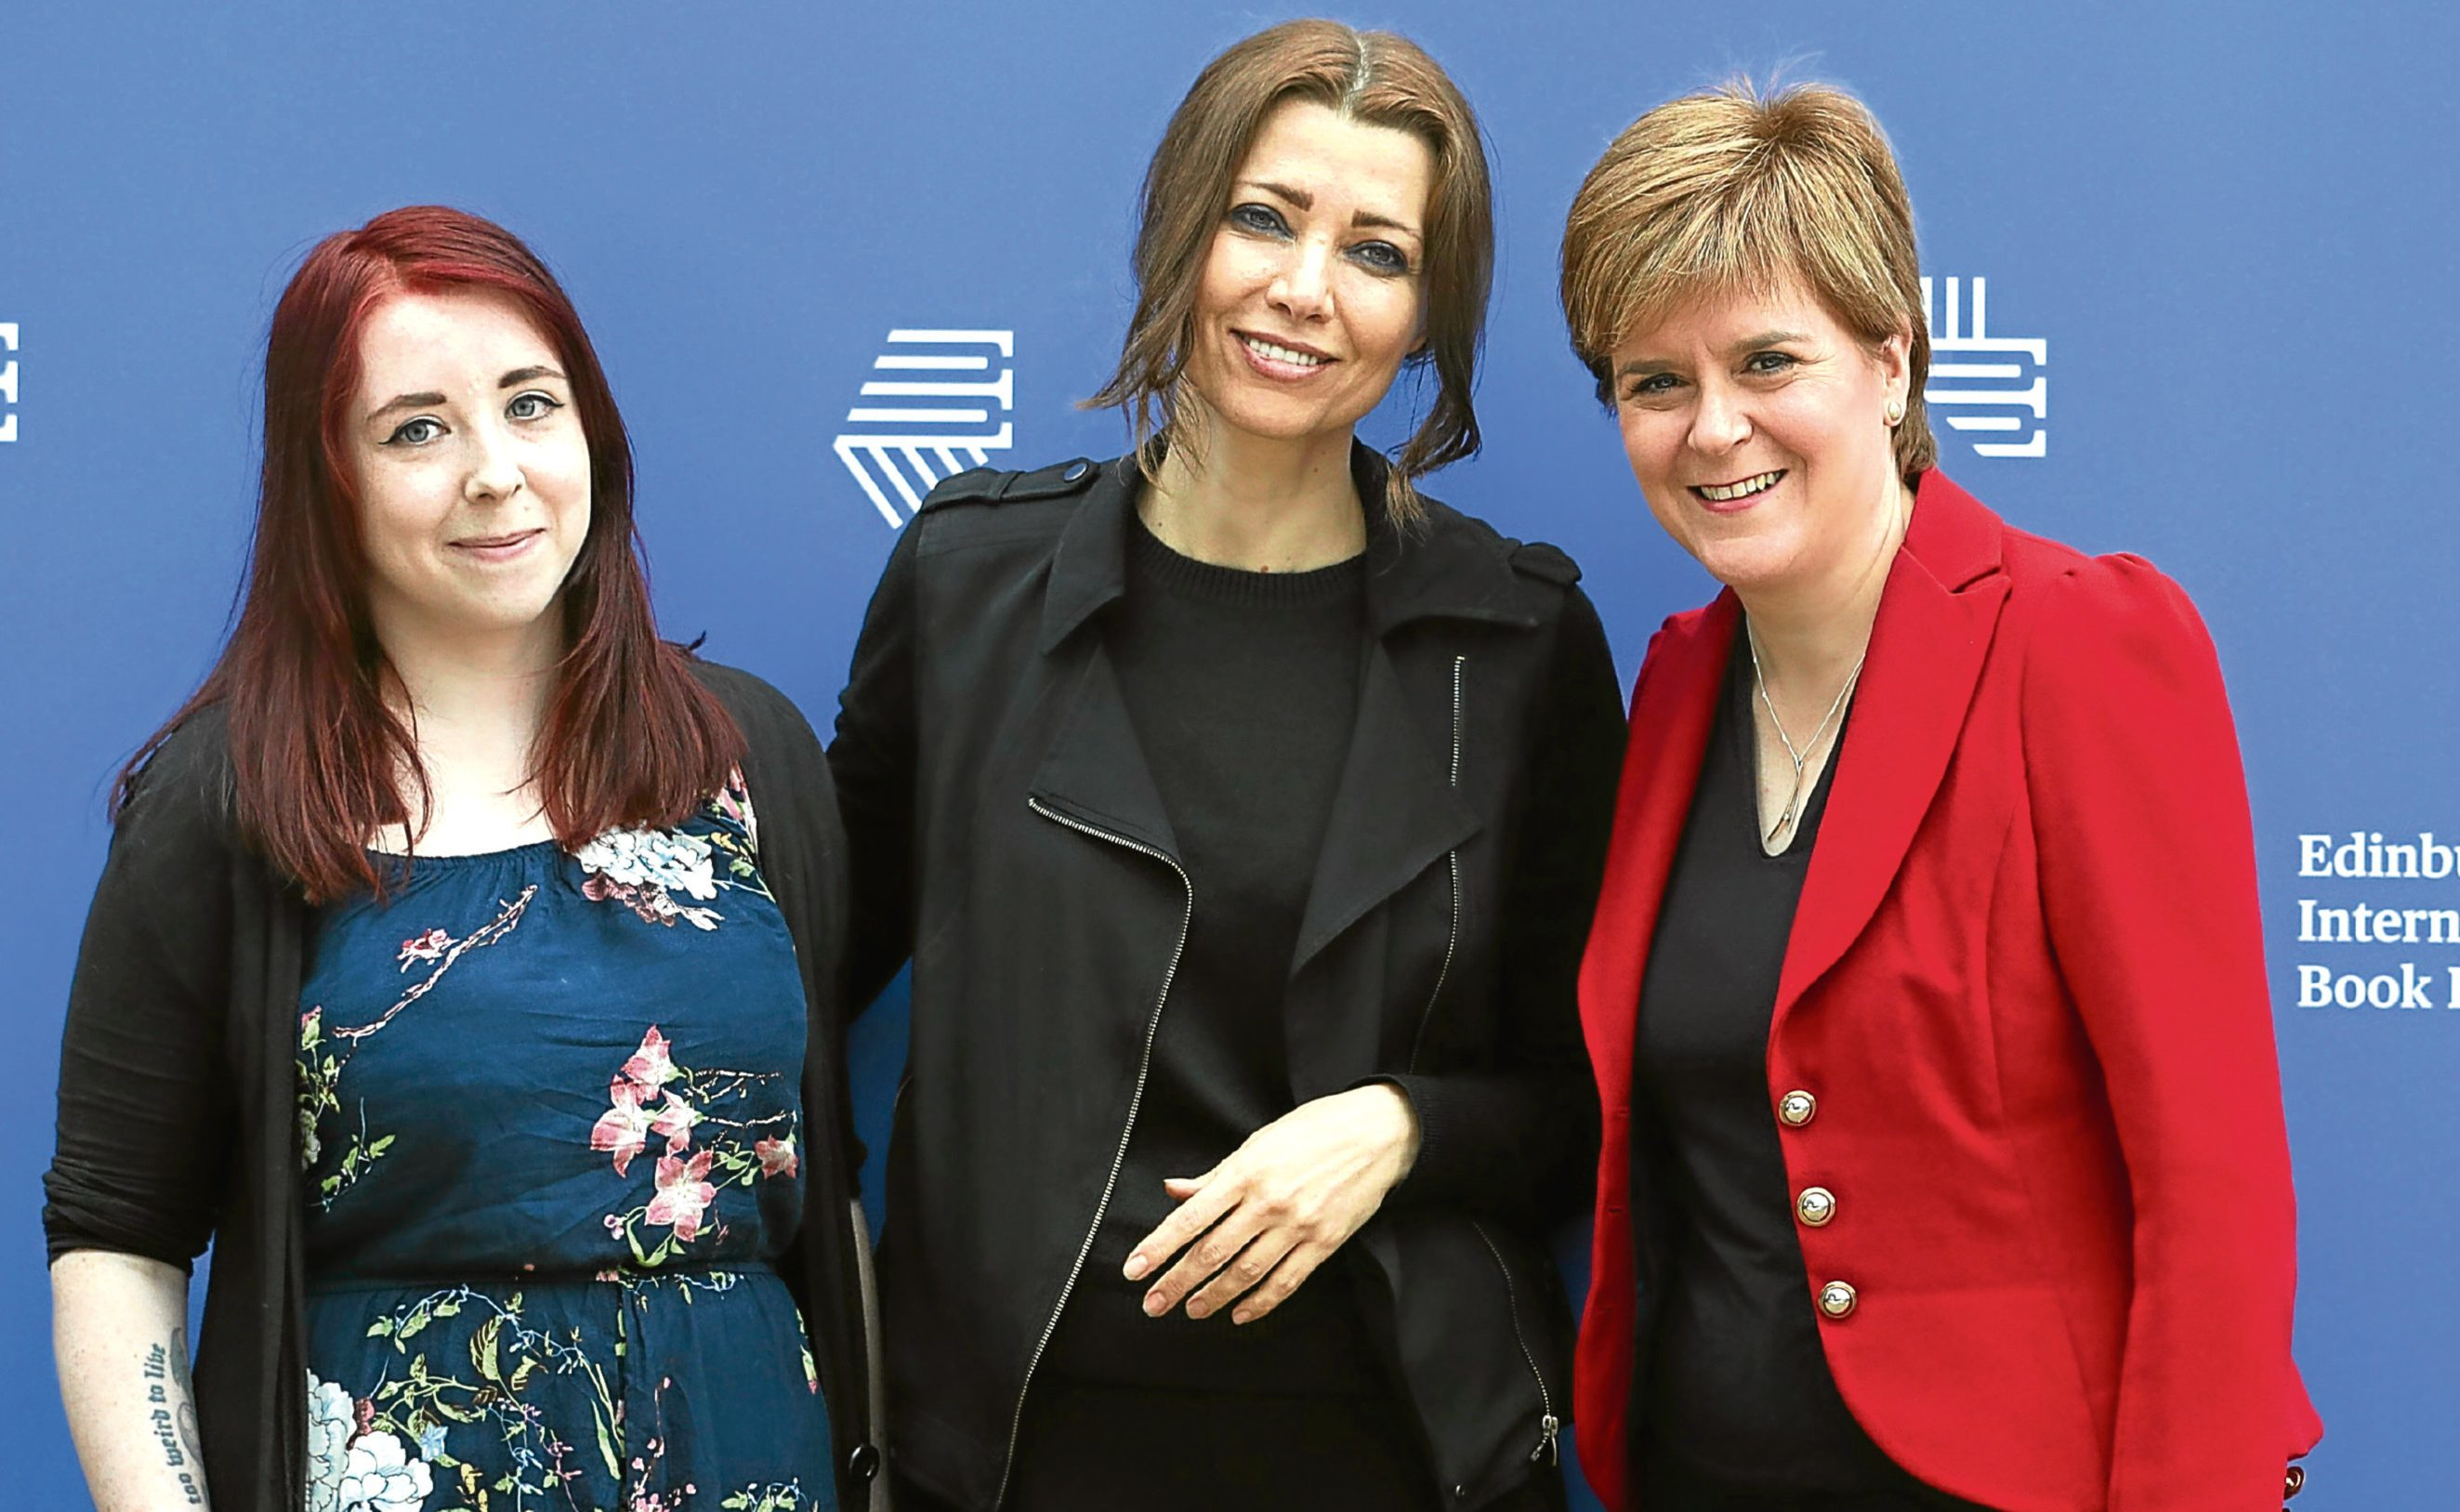 First Minister Nicola Sturgeon with Heather McDaid (left) and Elif Shafak (centre) at the Edinburgh International Book Festival.